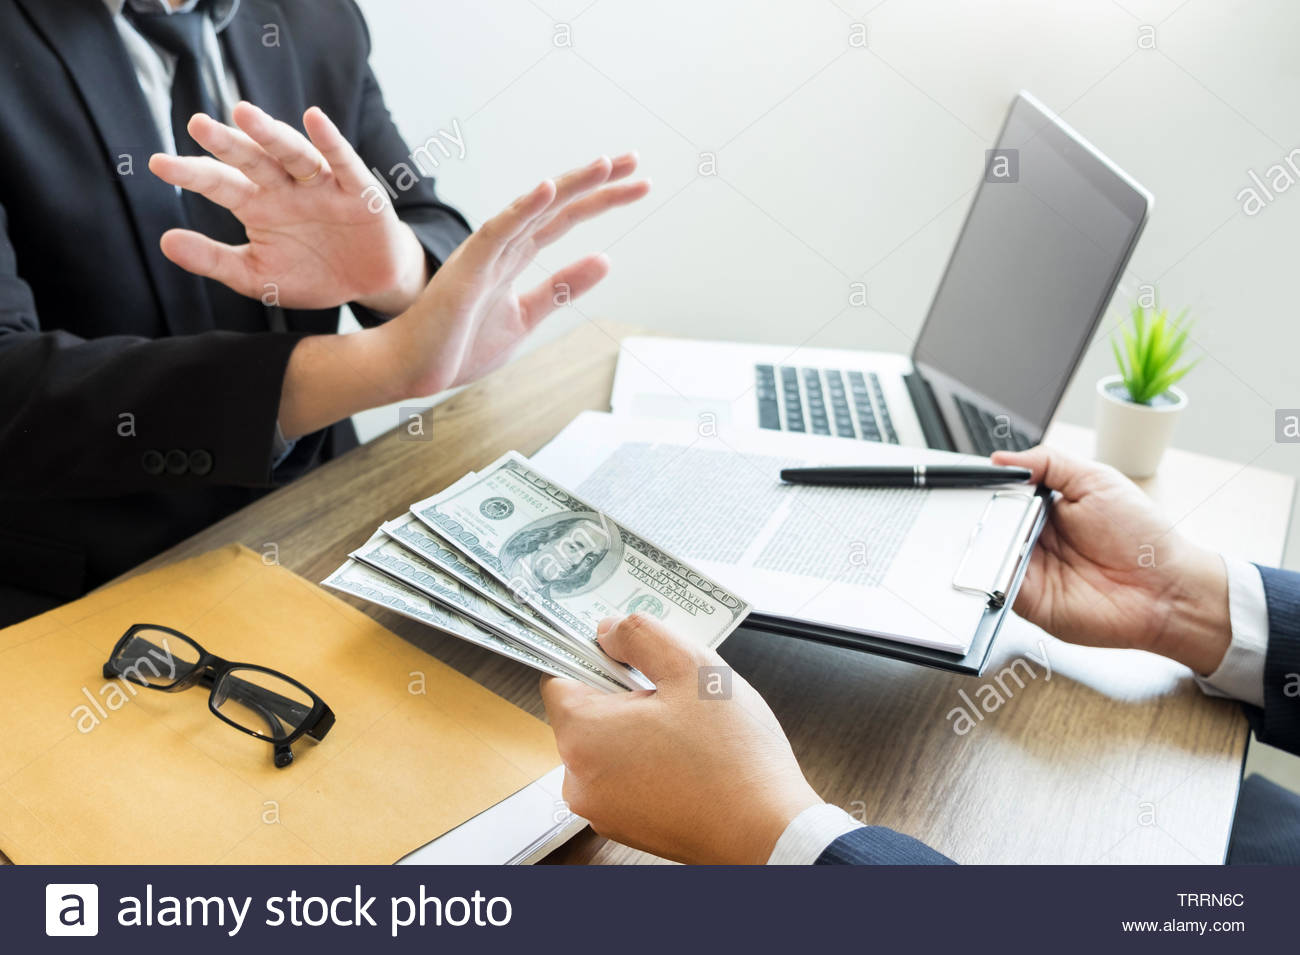 Management Anti-Corruption | ISO 37001 - Lead Auditor